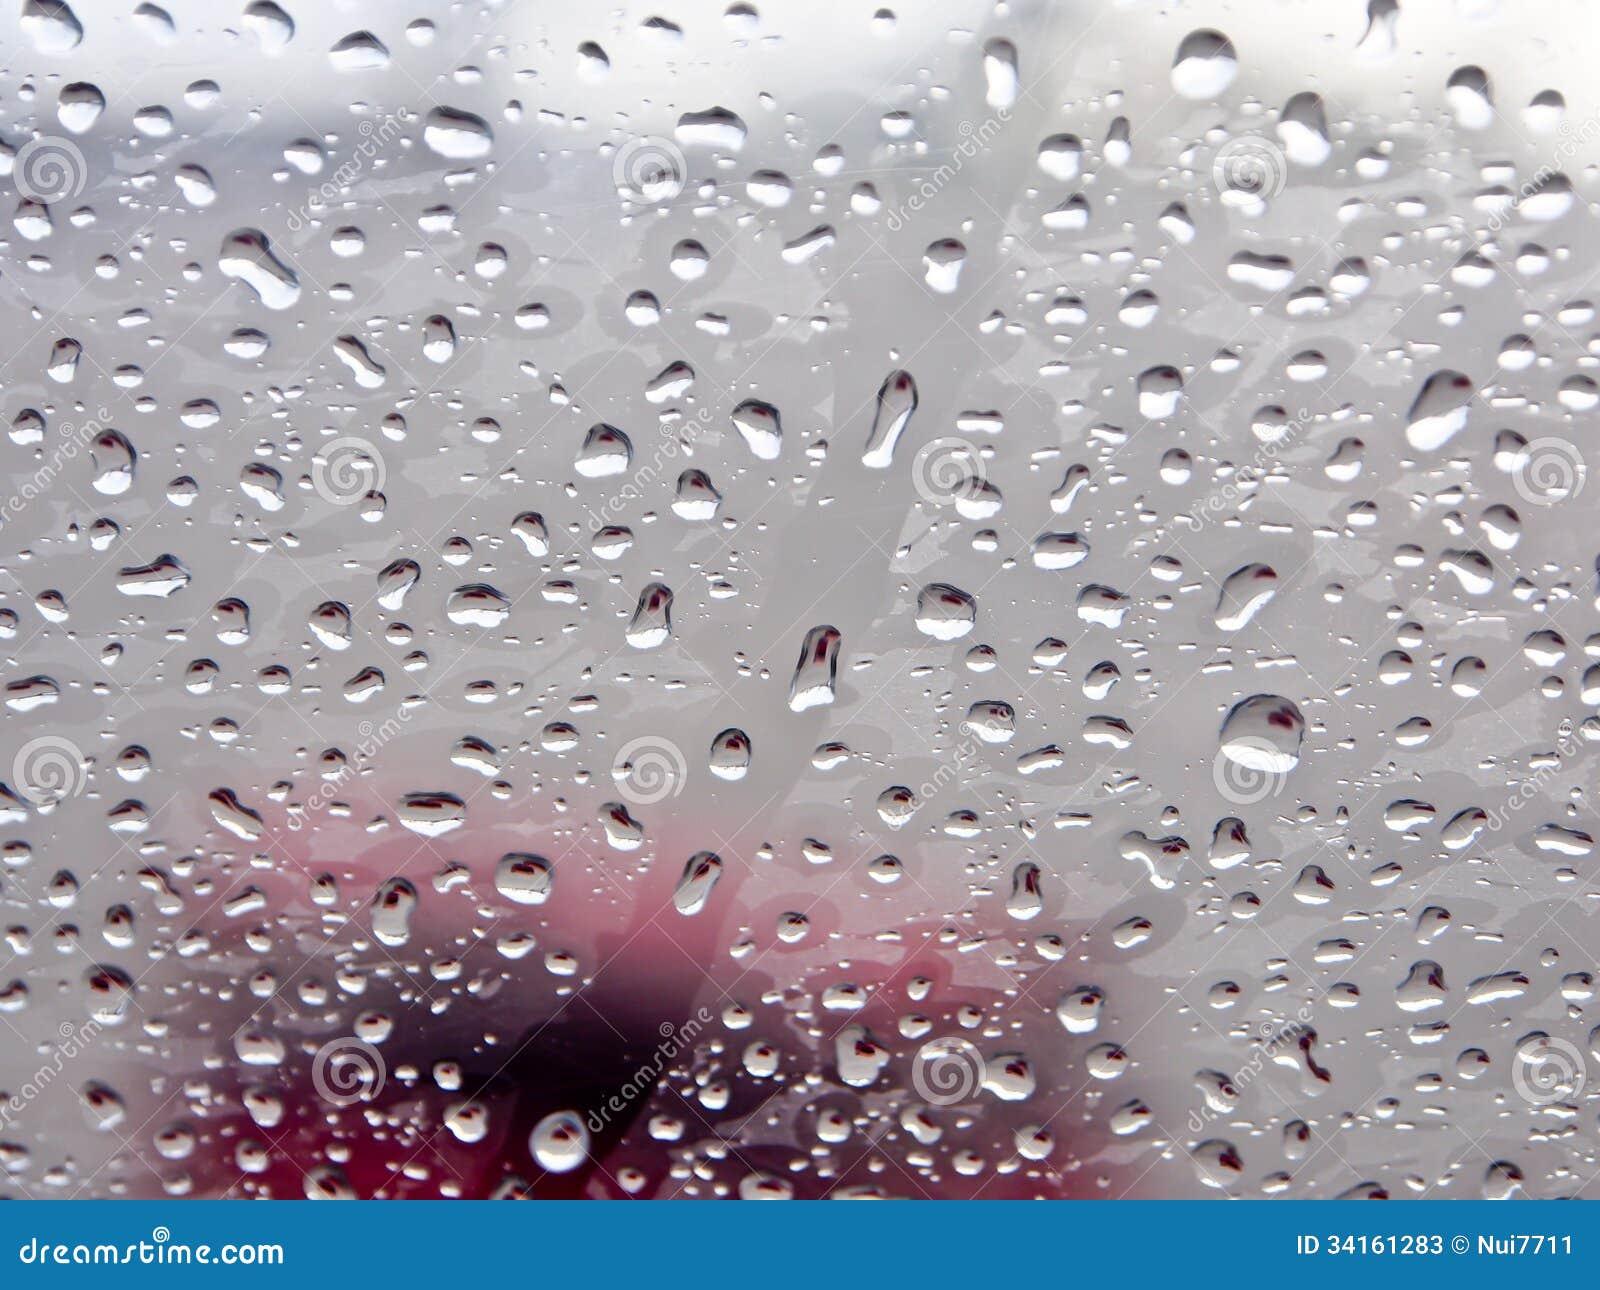 Bakgrund av regndroppar